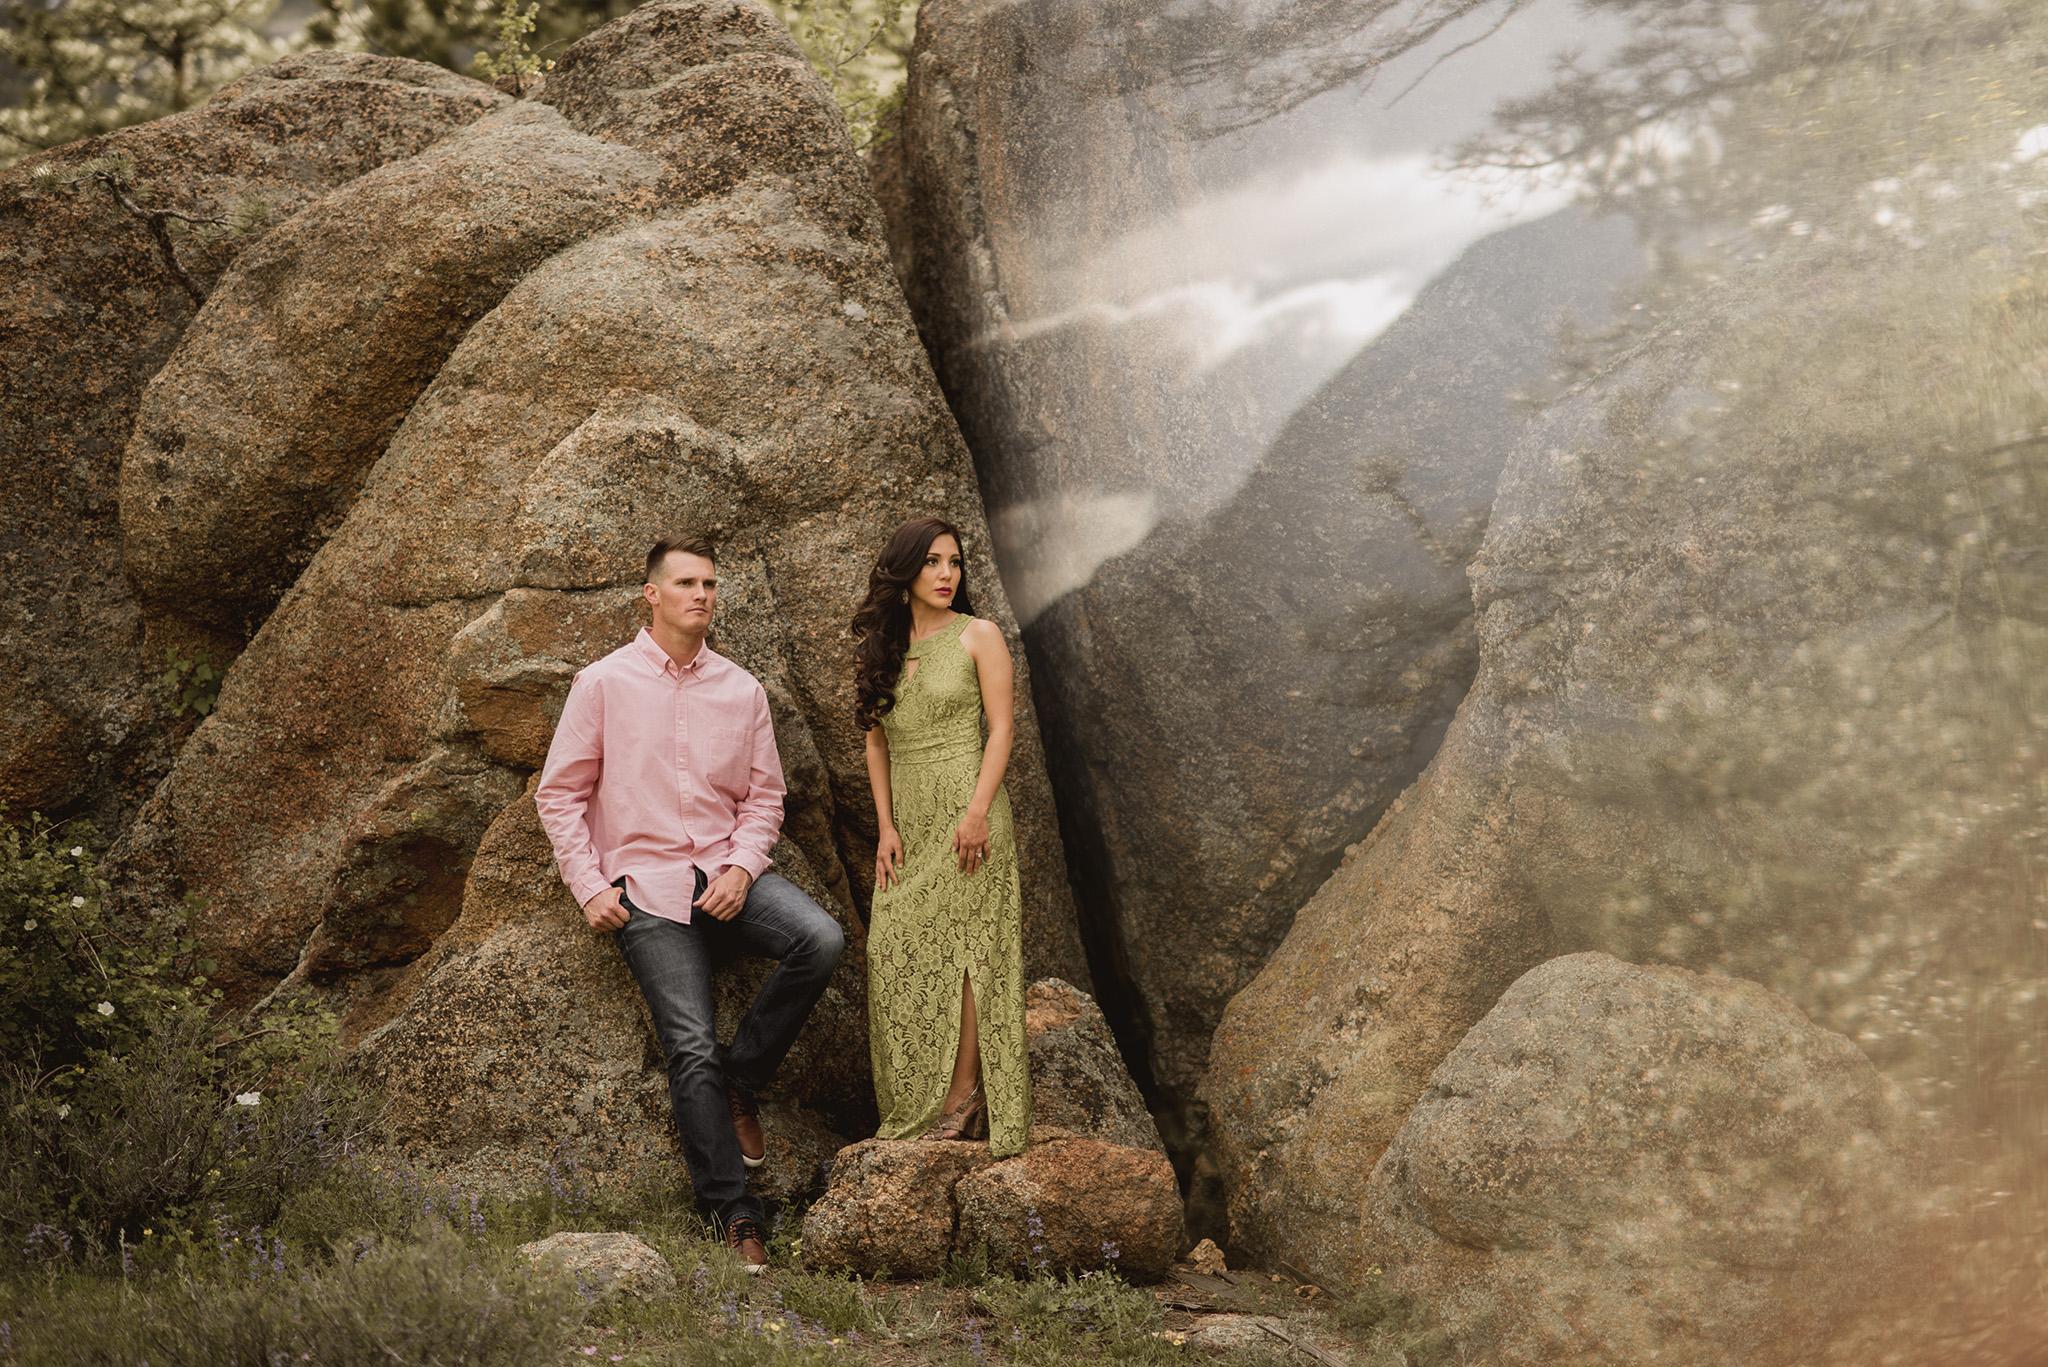 Estes-park-colorado-black-canyon-inn-engagement-photographer